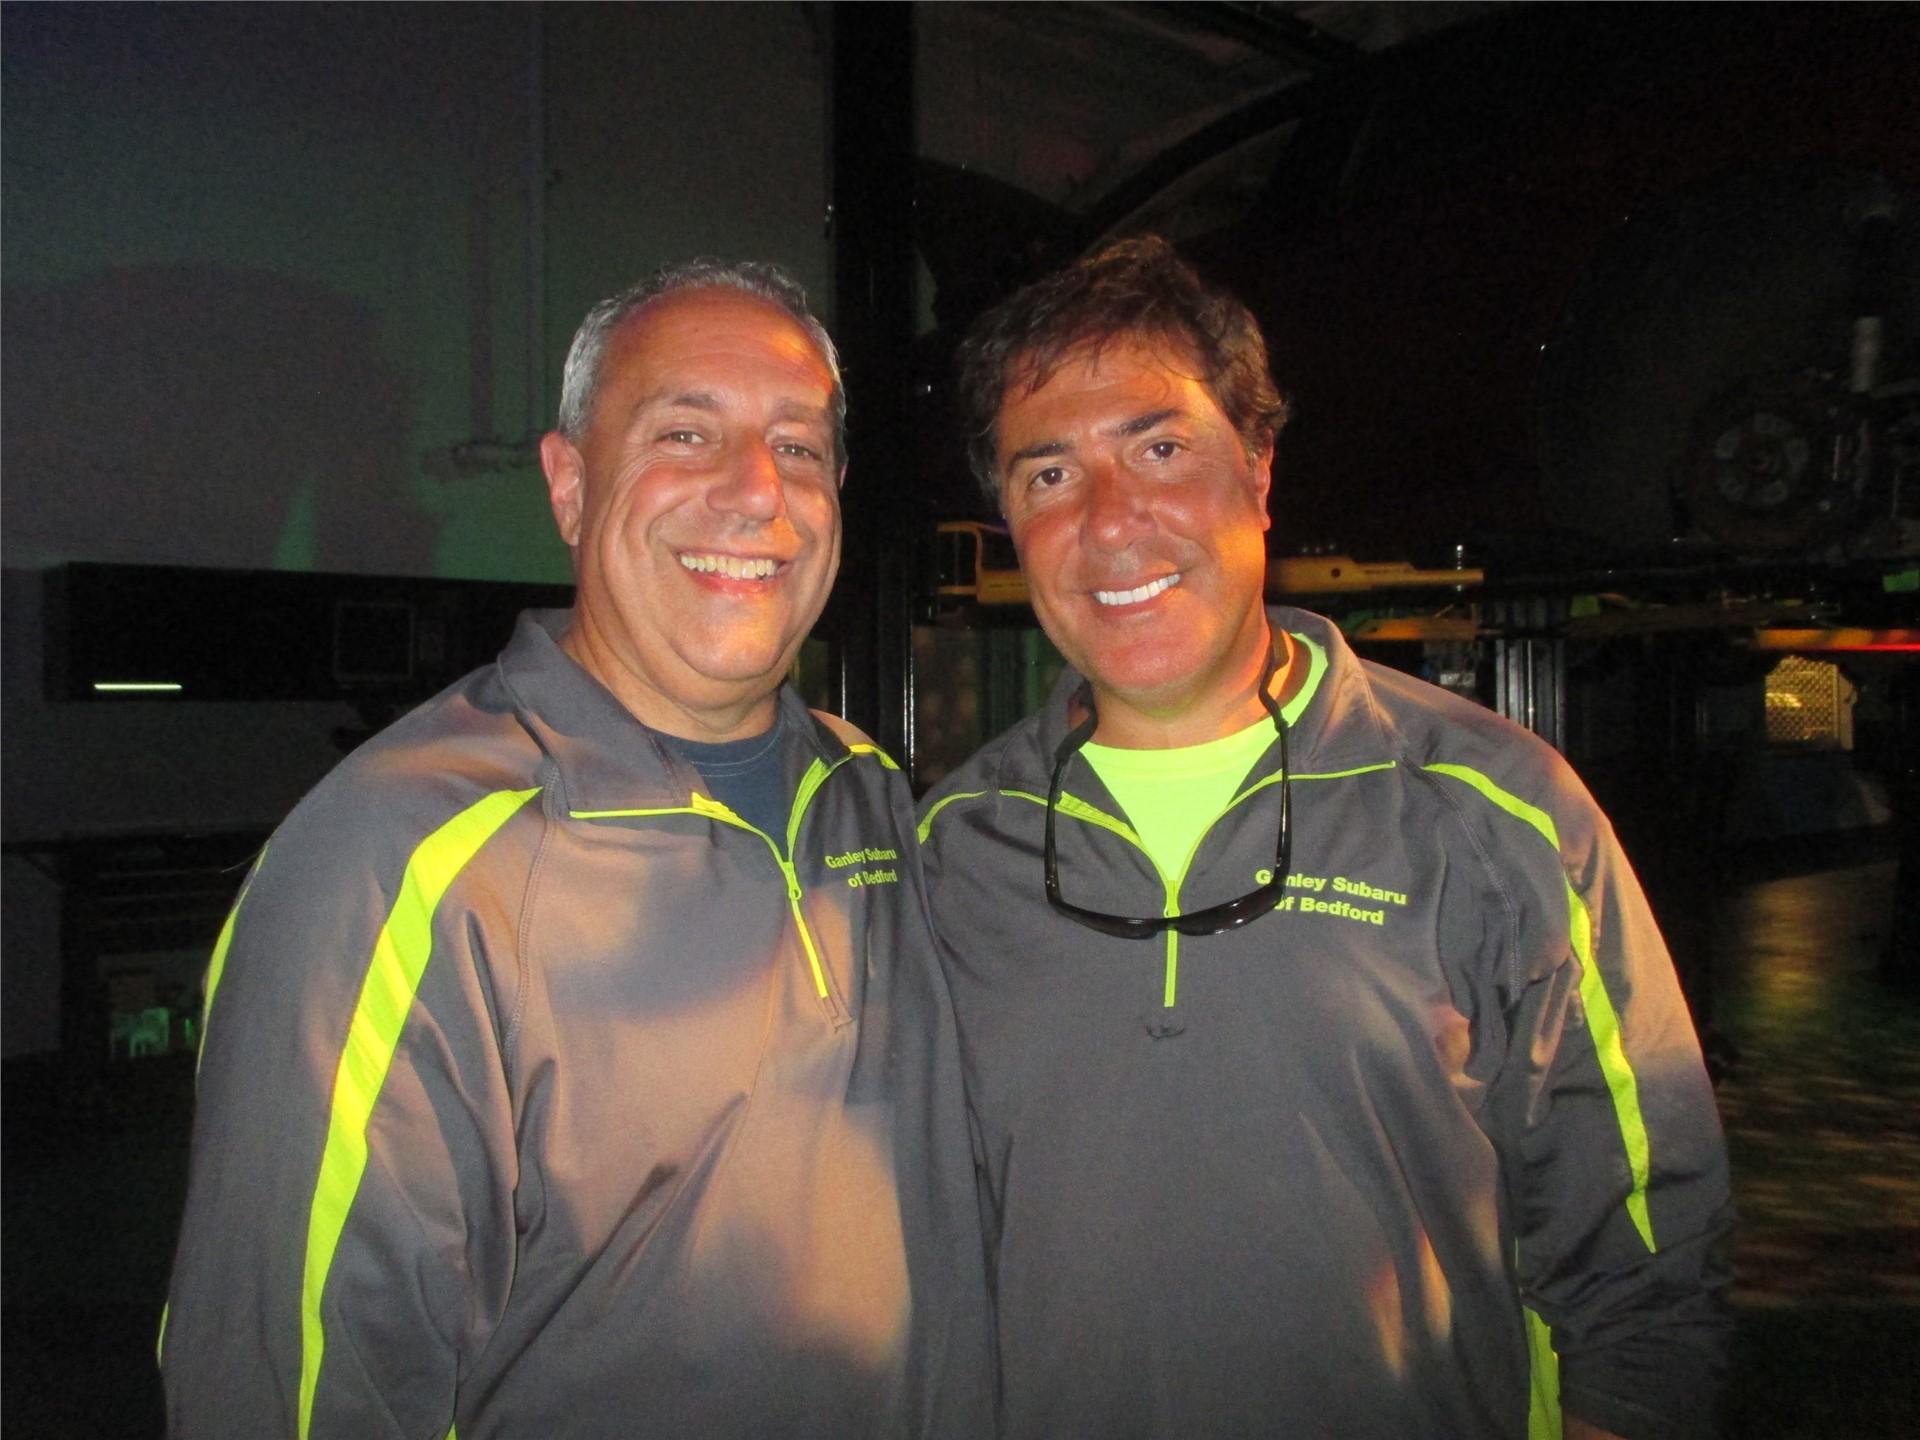 Bob Reiner and Michael Friedman